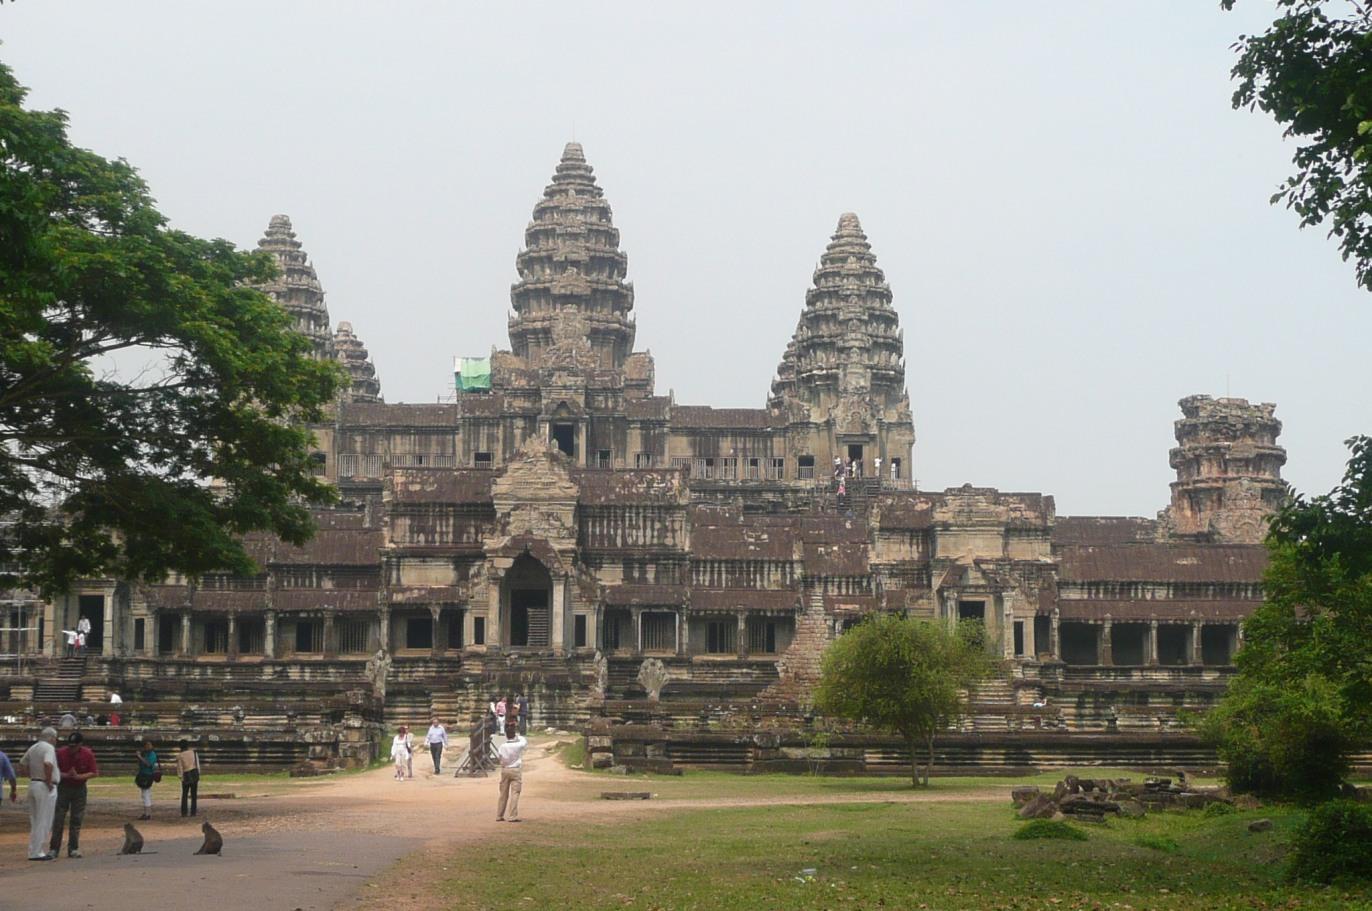 TEACHING GEOGRAPHY: Angkor Wat - Cambodia